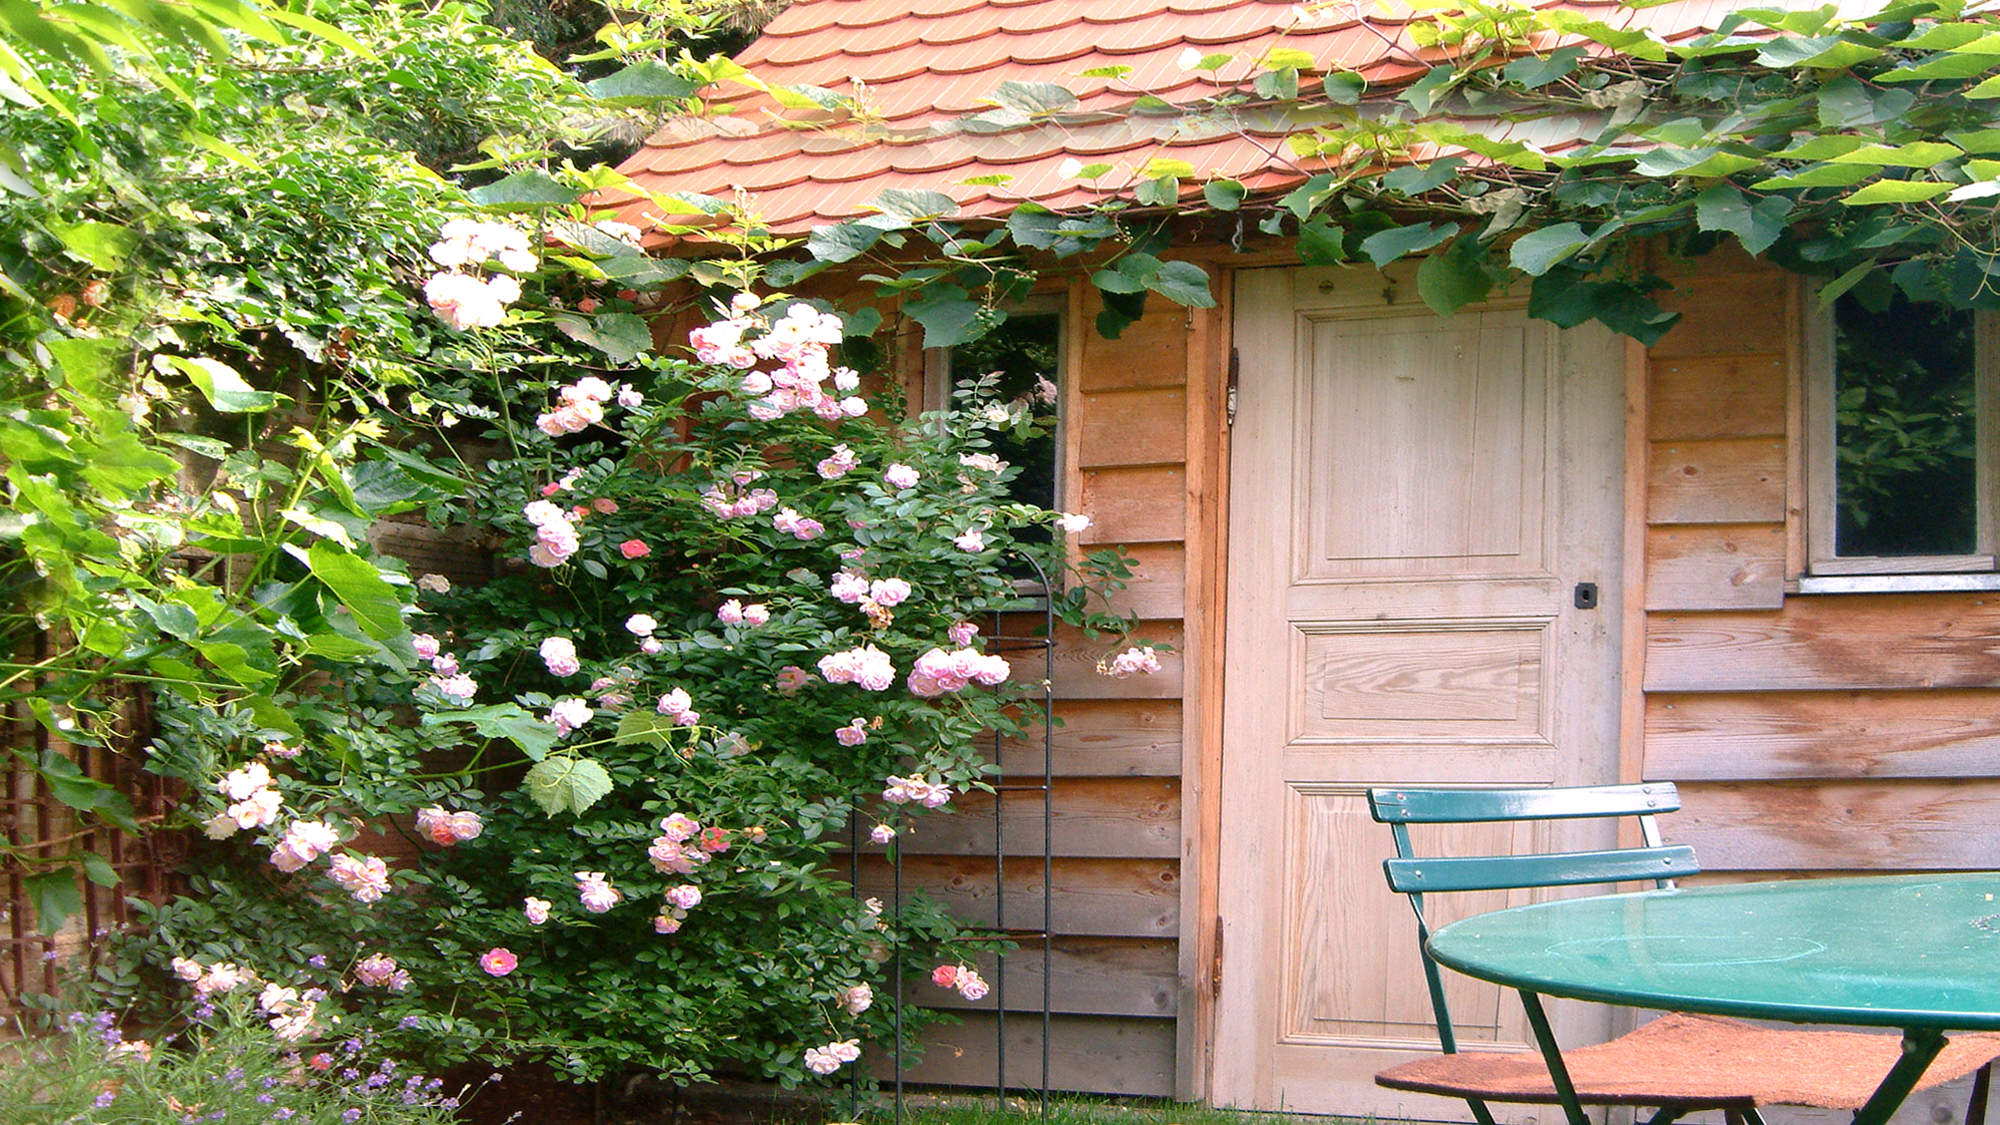 Heike_Bogatzki_Landhausgarten.jpg